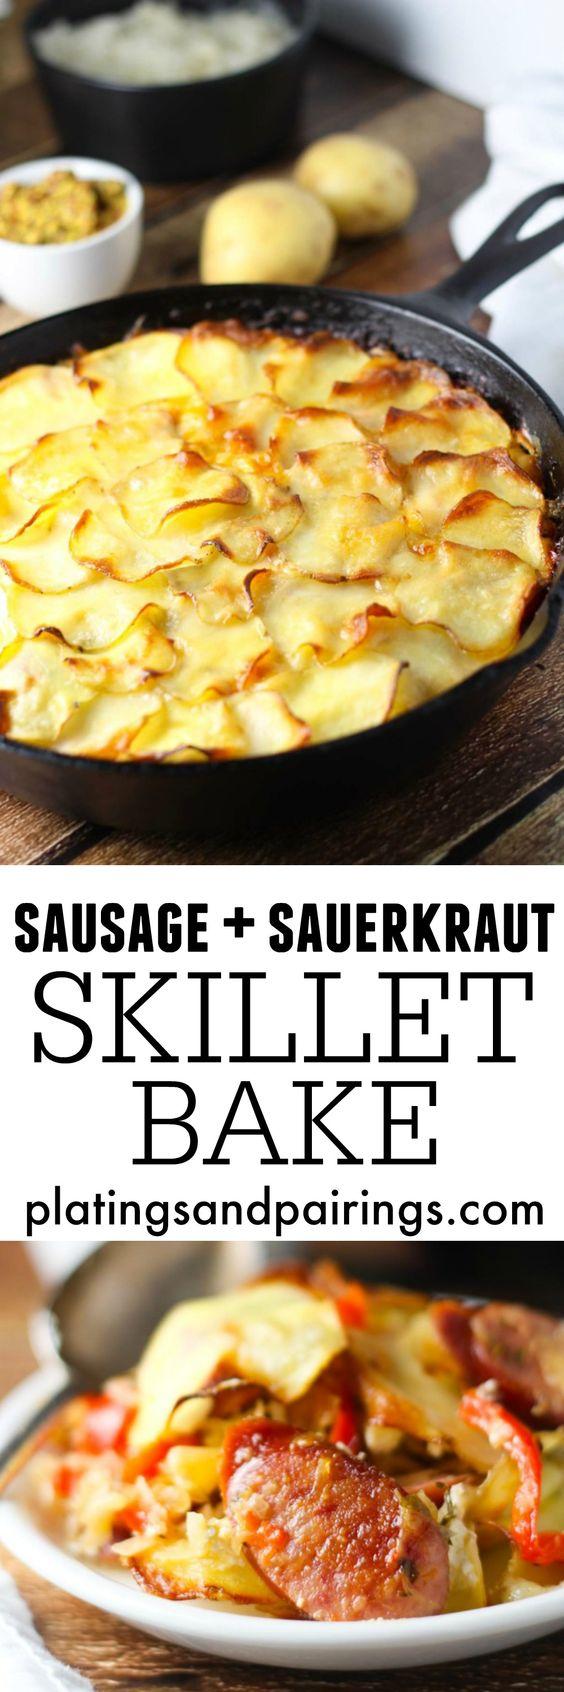 explore sauerkraut skillet sausage sauerkraut and more sauerkraut ...